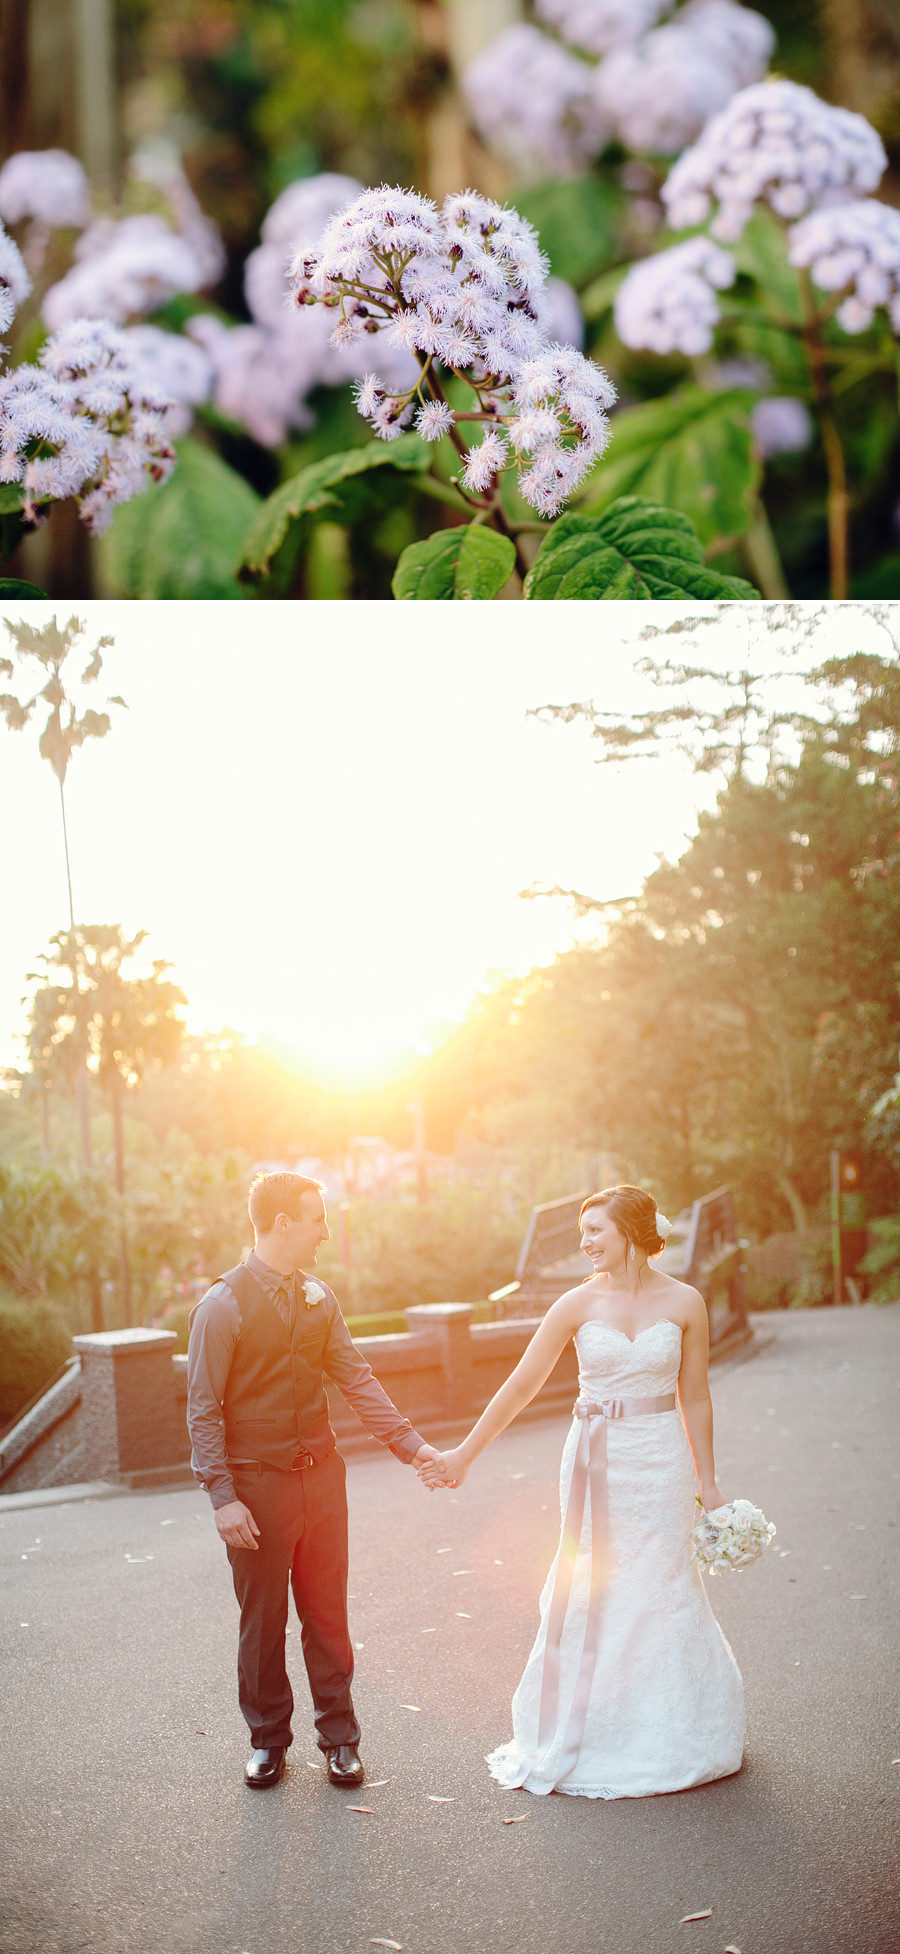 Modern Wedding Photography: Portraits